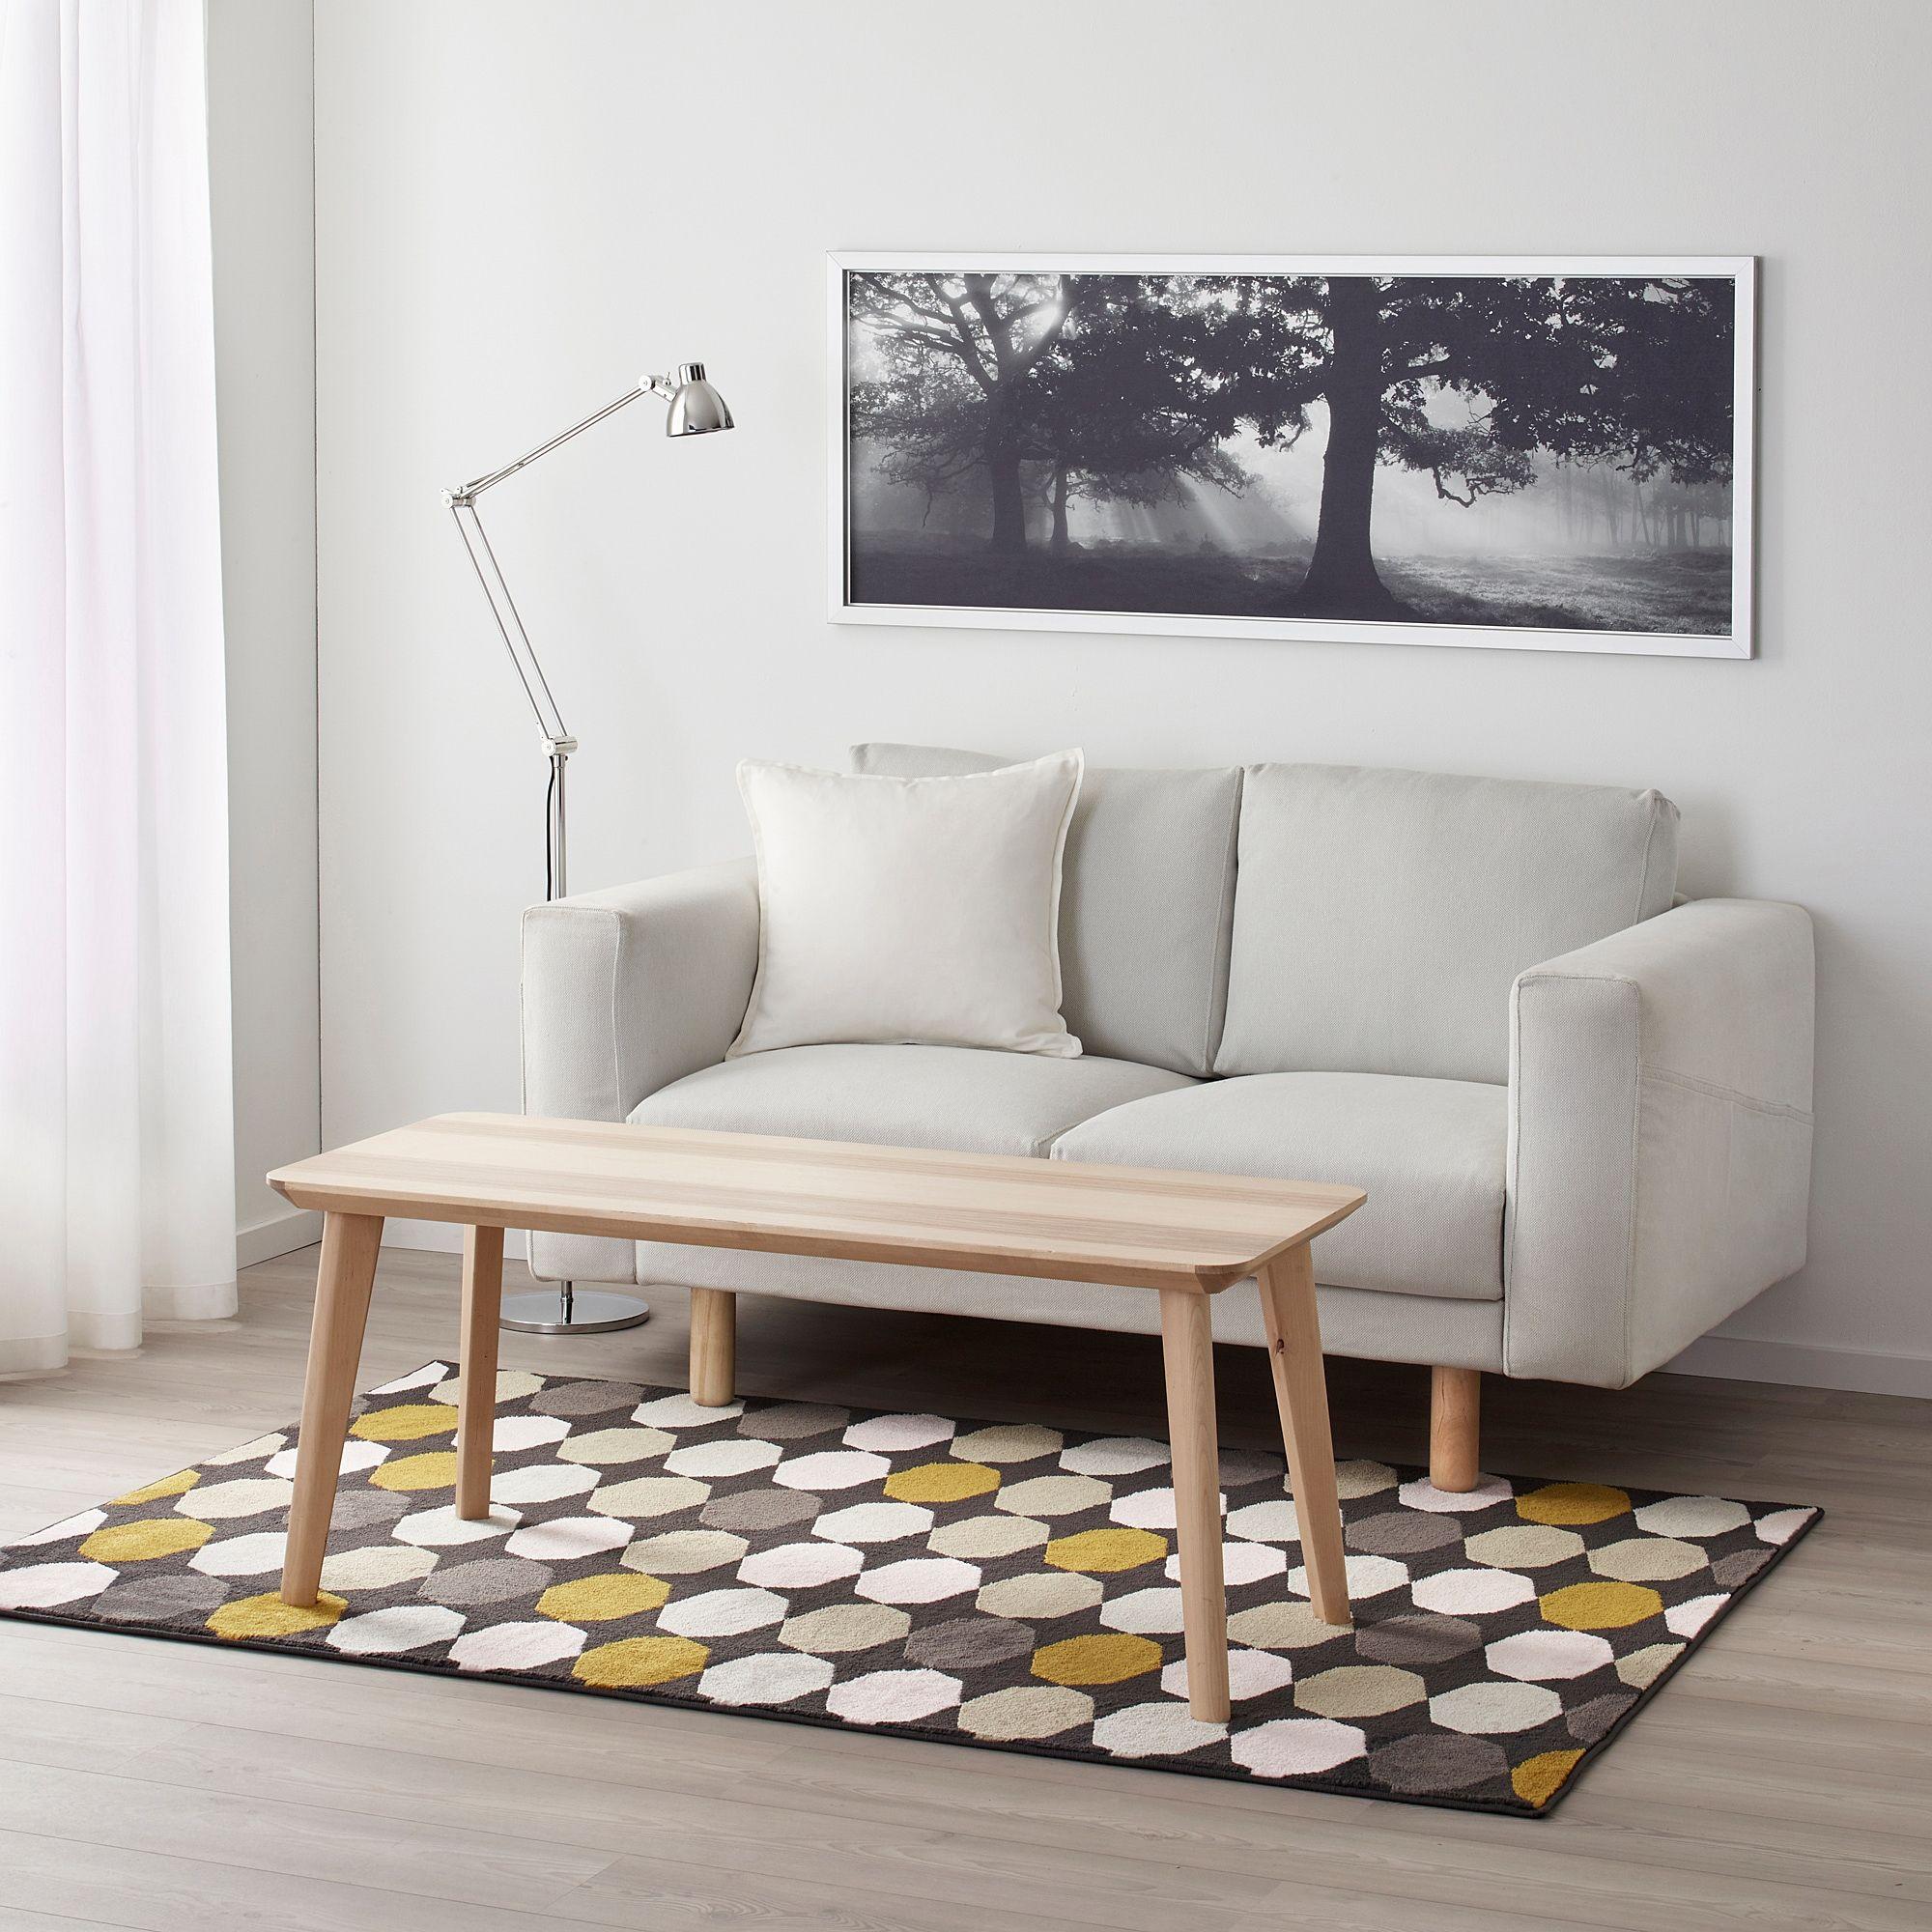 Torrild Tapis Poils Ras Multicolore 133x195 Cm Ikea En 2020 Tapis Ikea Rug